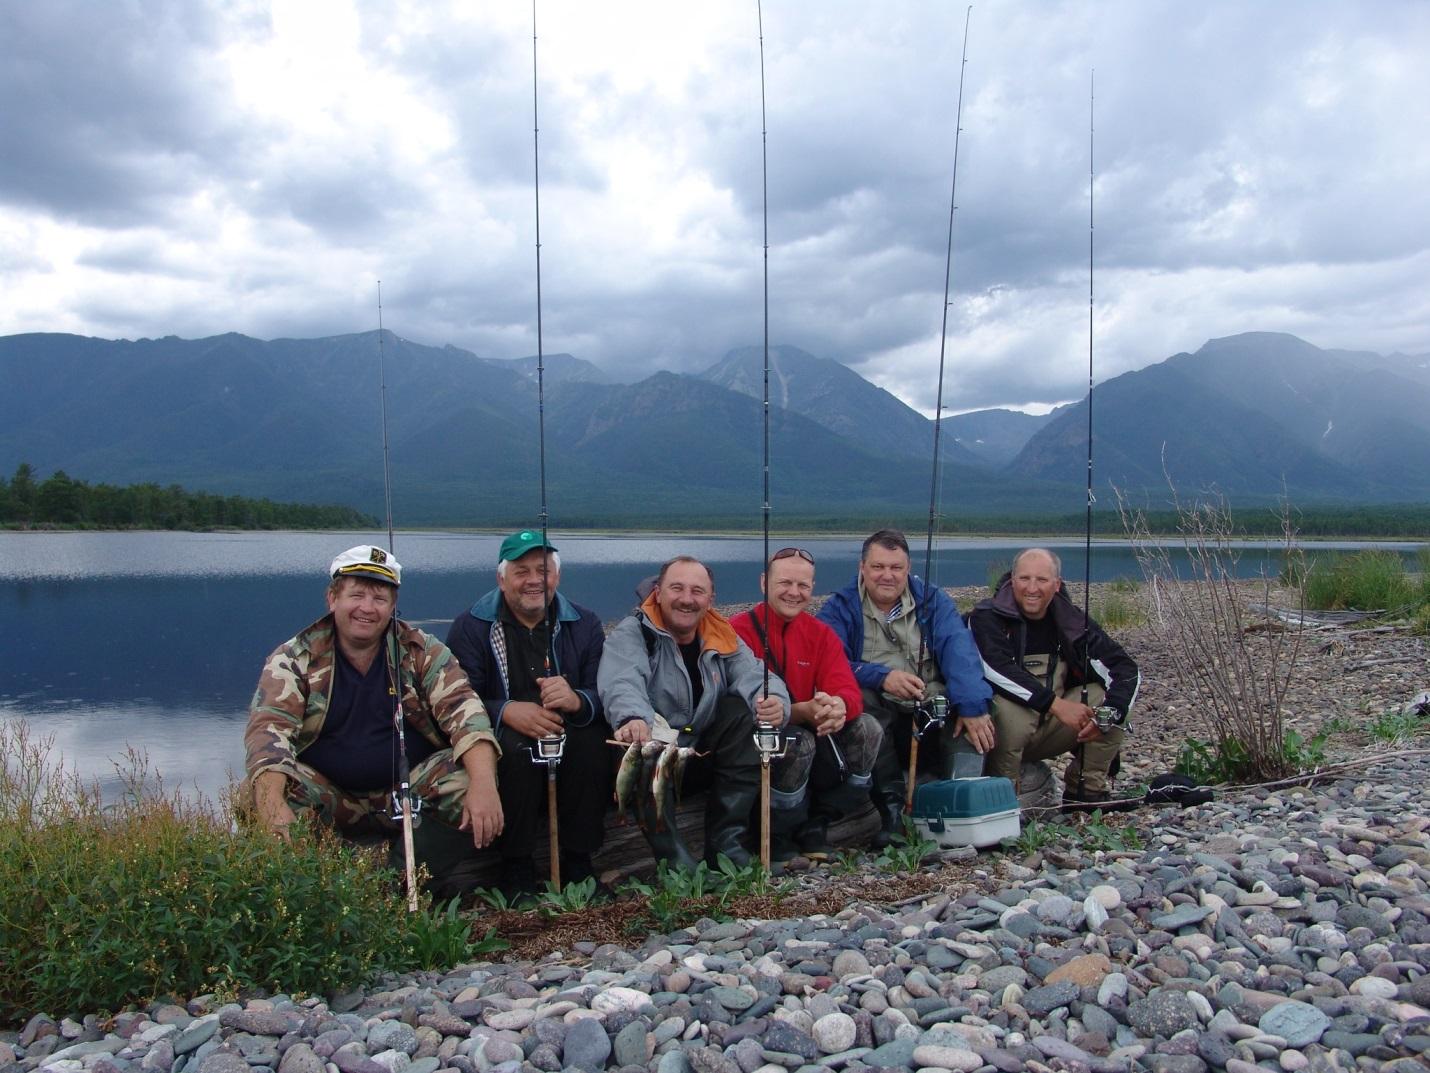 C:\Users\User\Desktop\All information Maksimov\Tourism\BAIKAL SAFARI\Fishing\Baikal fishing reports\2010\DSC02825.JPG